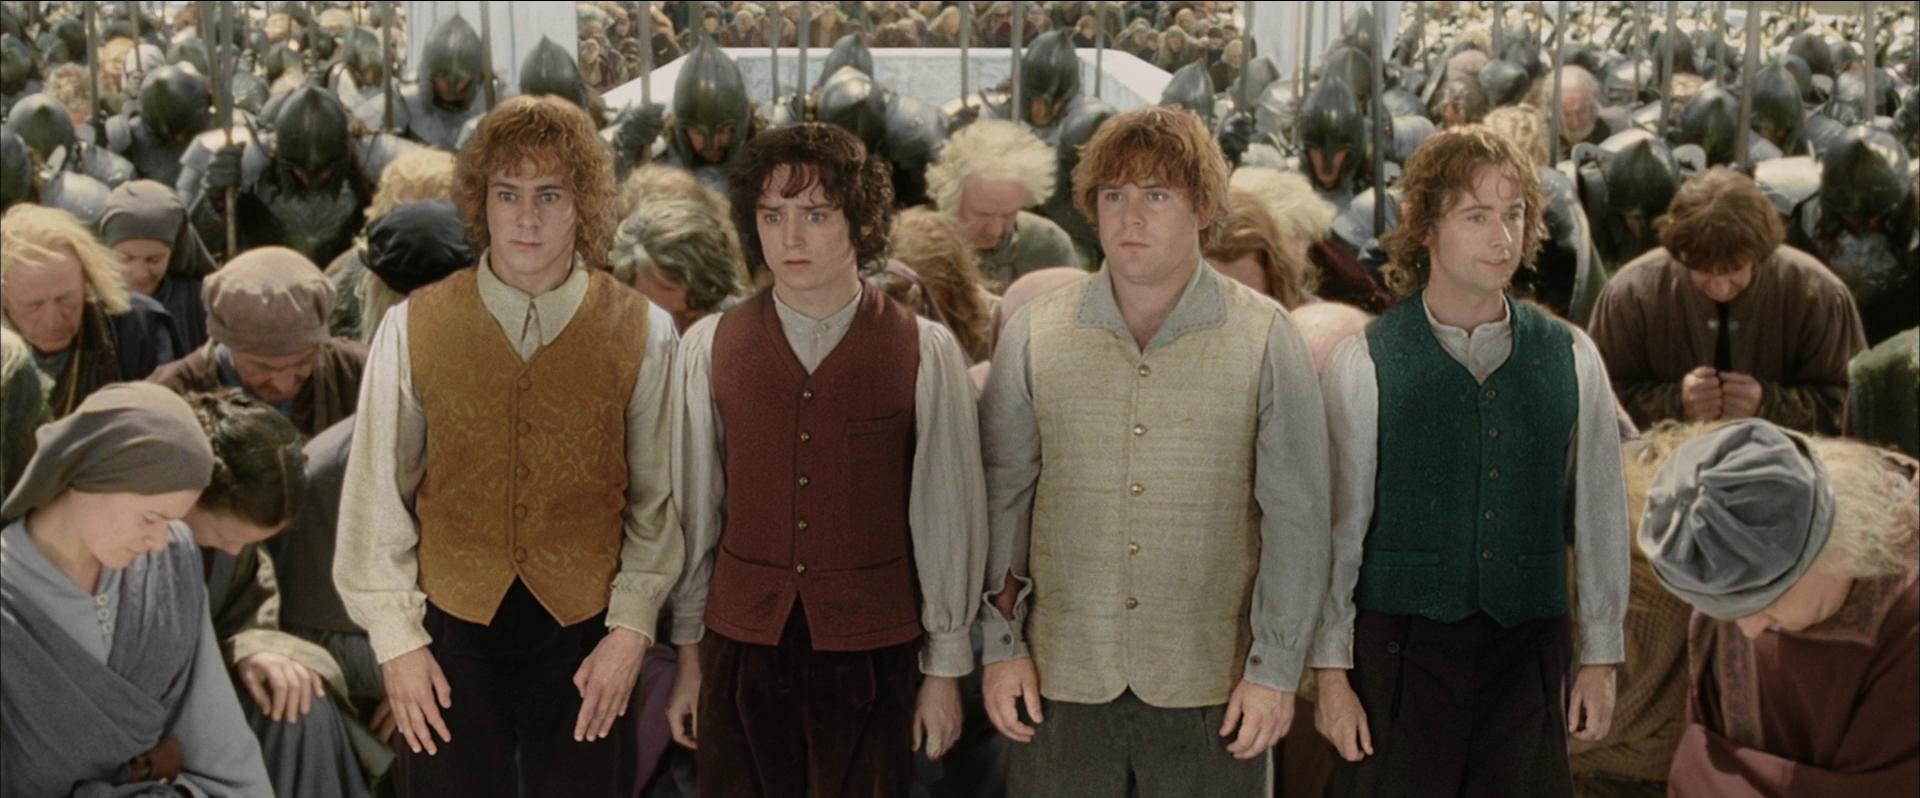 Legolas Quotes Wallpaper Tolkiens Legendarium Why Don T Merry And Pippin Seem